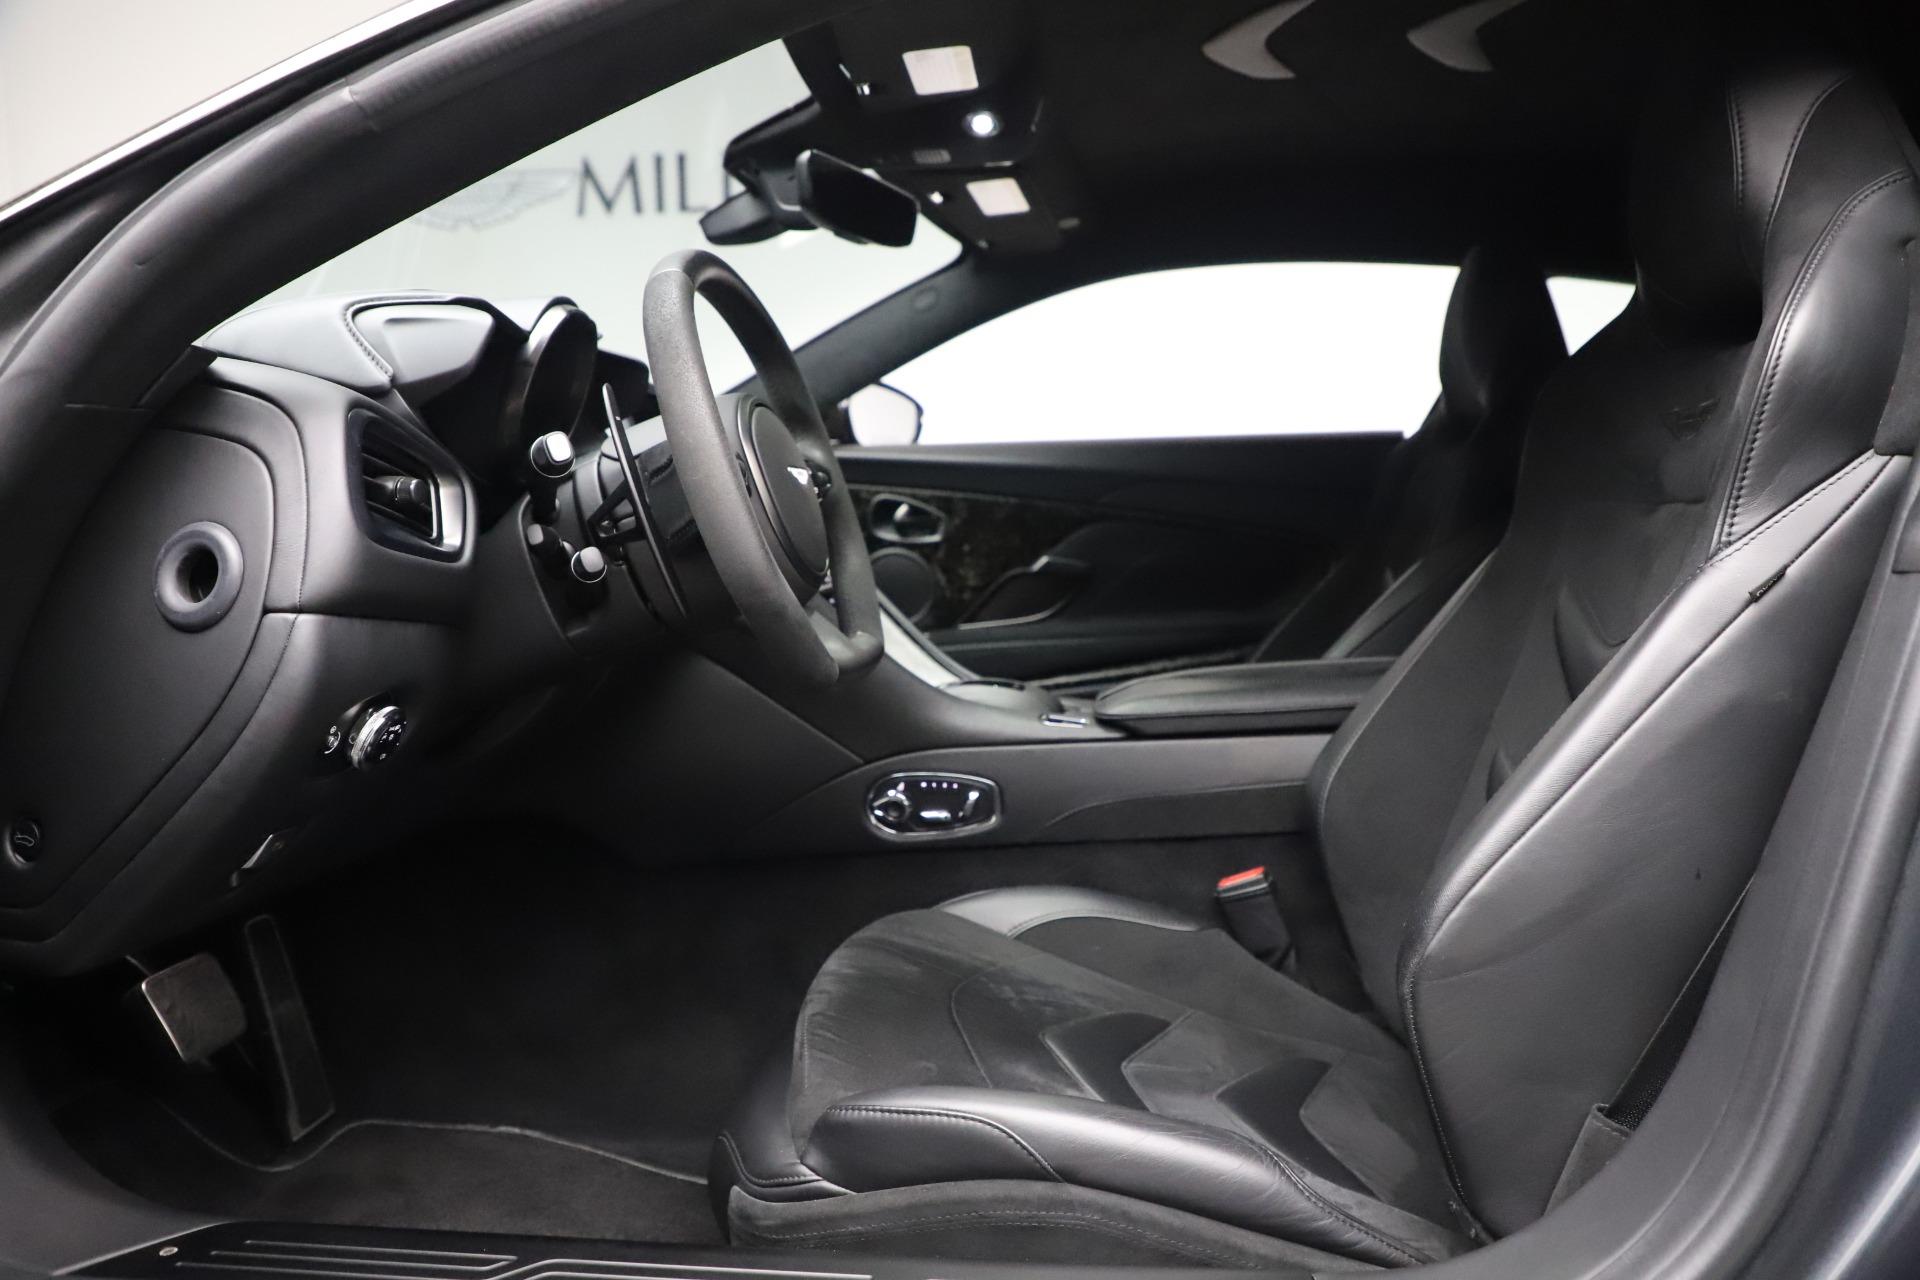 Used 2019 Aston Martin DBS Superleggera Coupe For Sale In Westport, CT 3570_p14